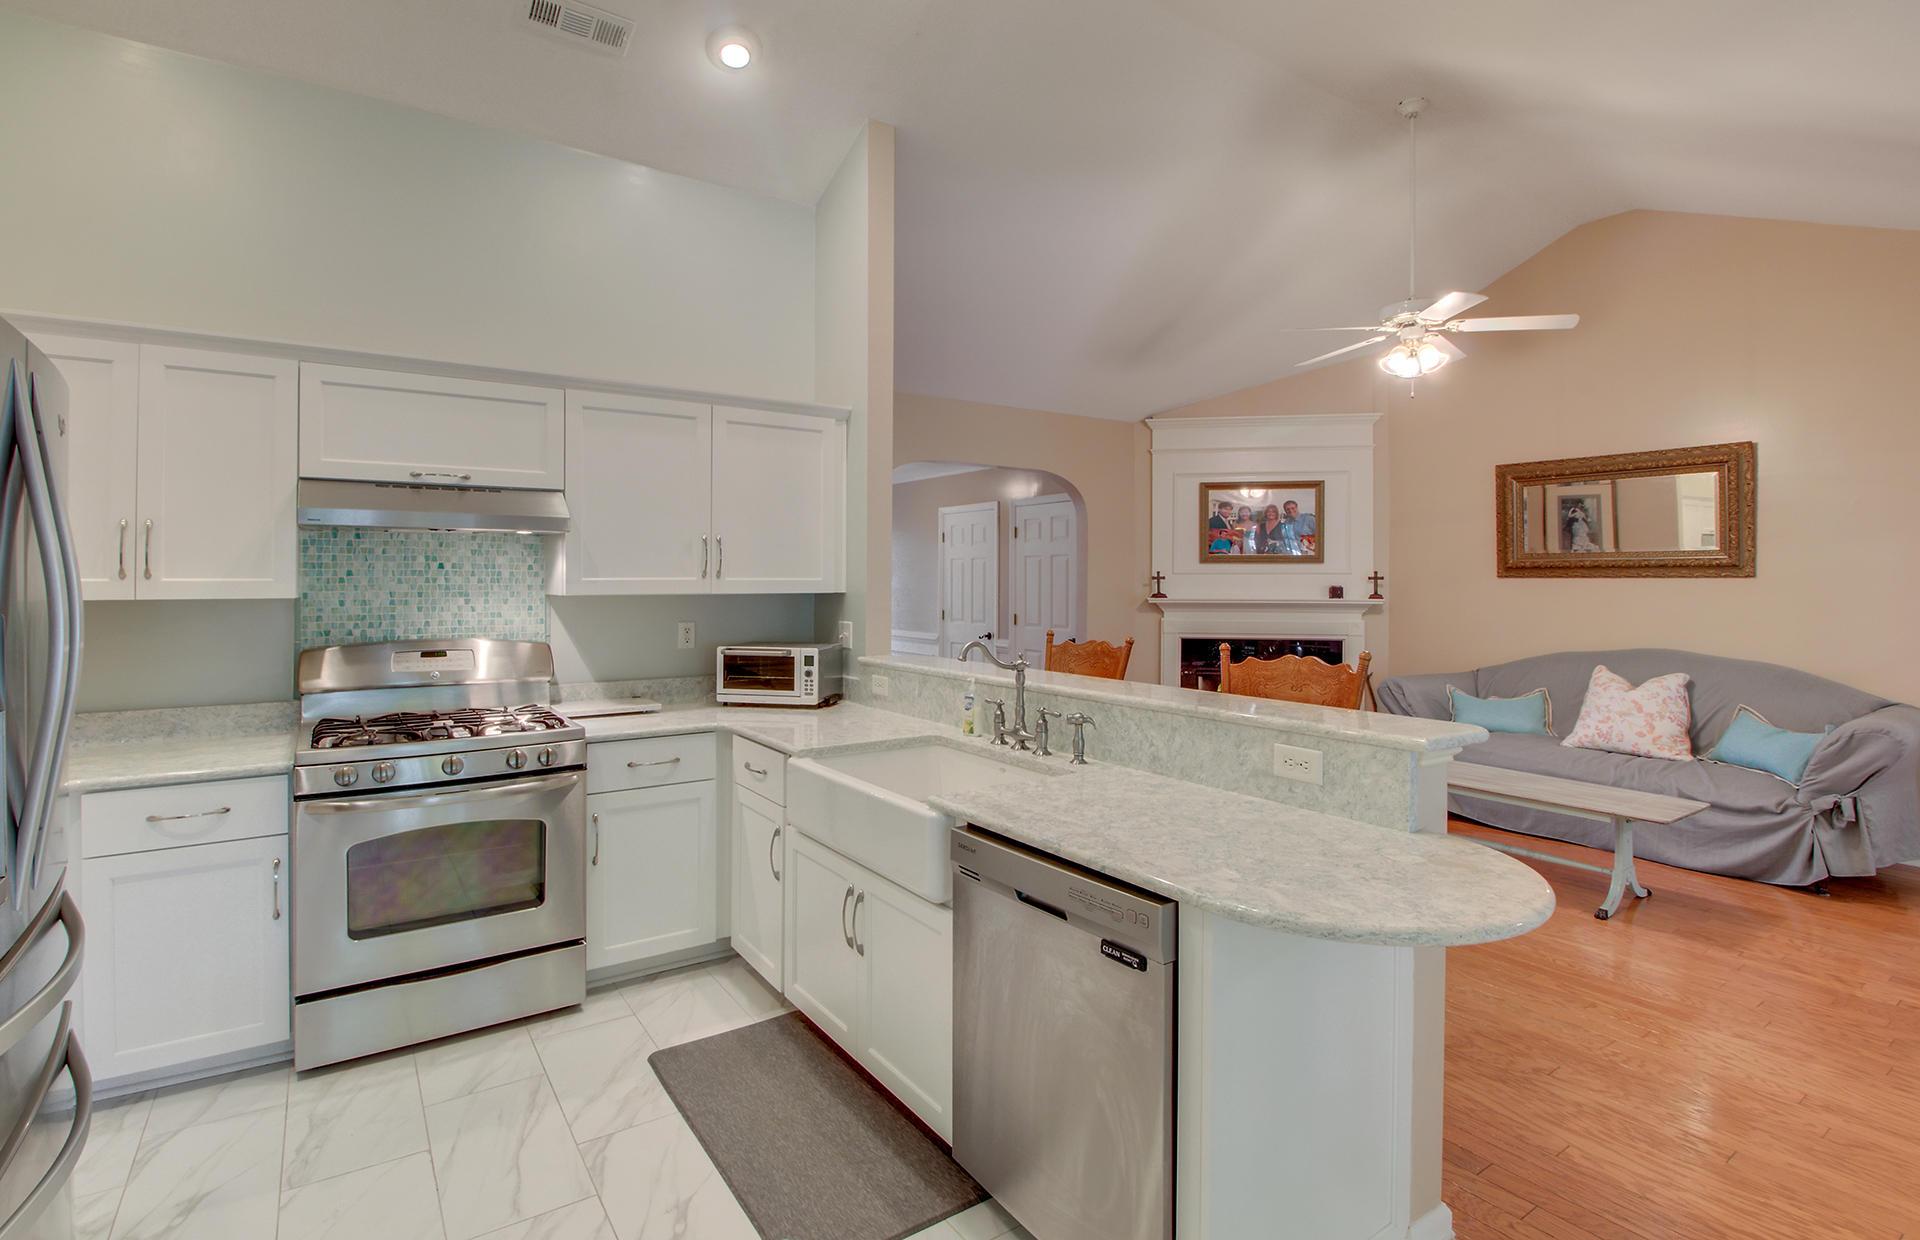 Park West Homes For Sale - 1500 Wellesley, Mount Pleasant, SC - 28